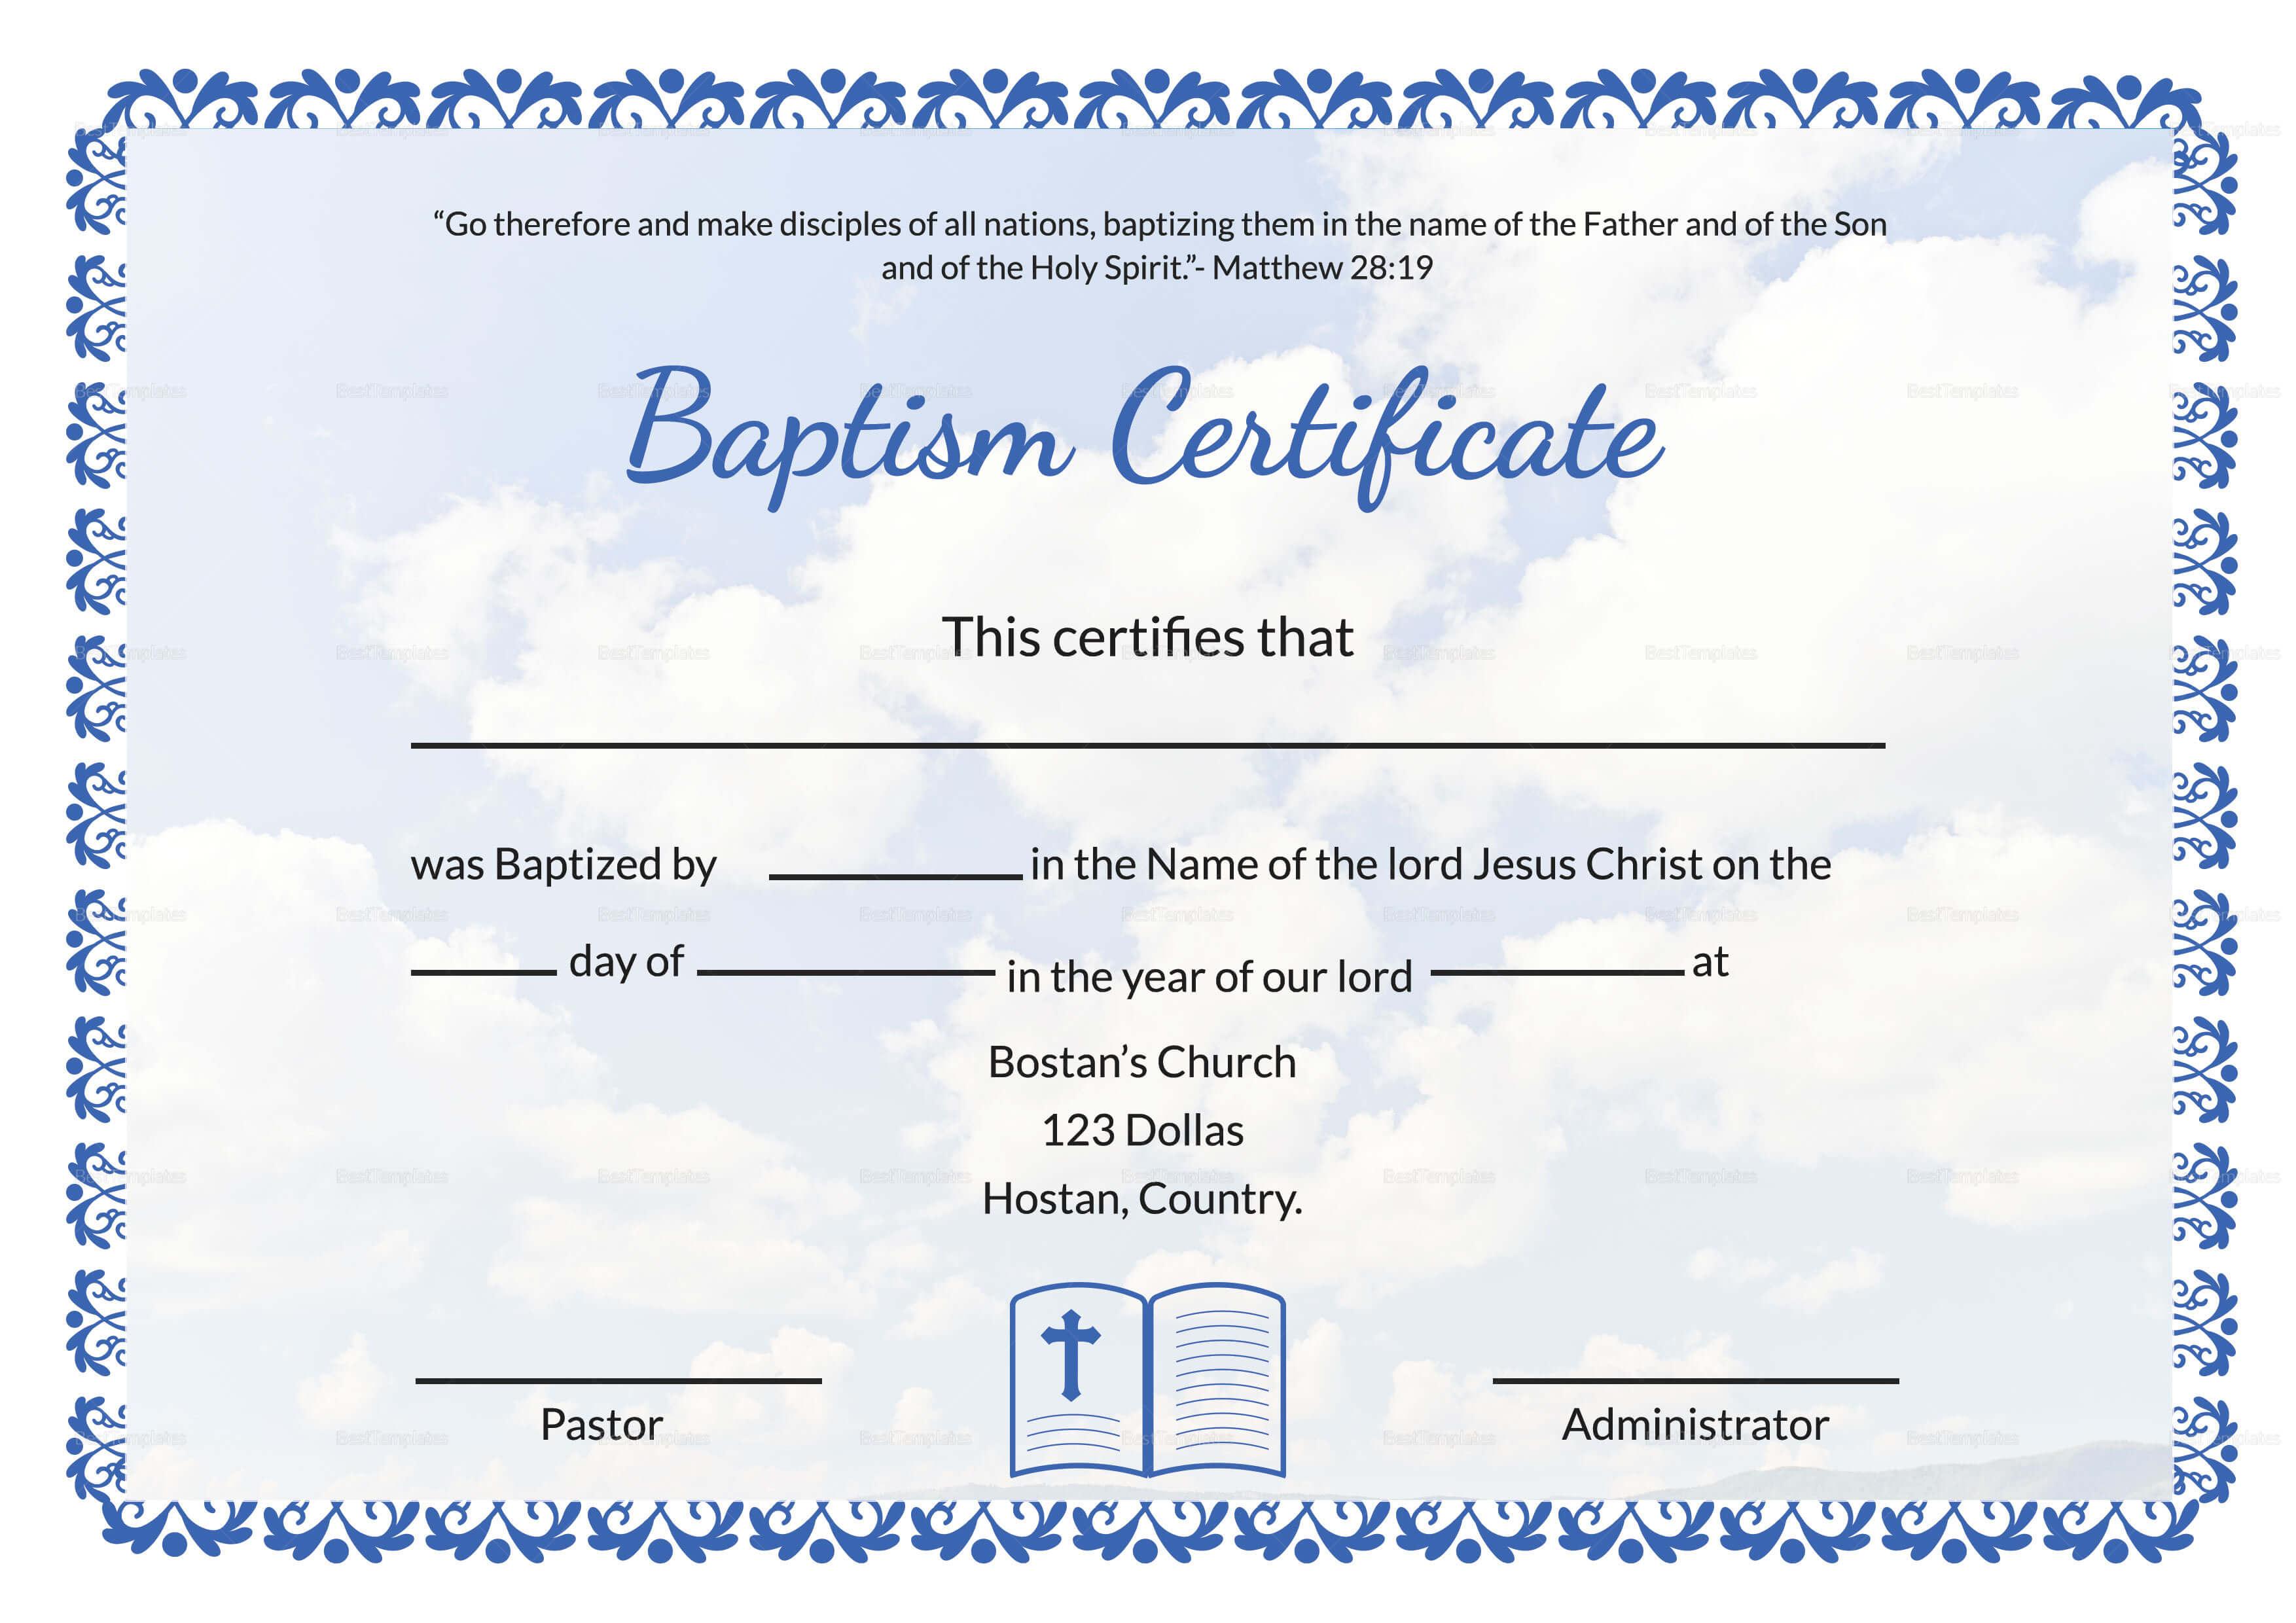 001 Certificate Of Baptism Template Unique Ideas Broadman inside Christian Baptism Certificate Template